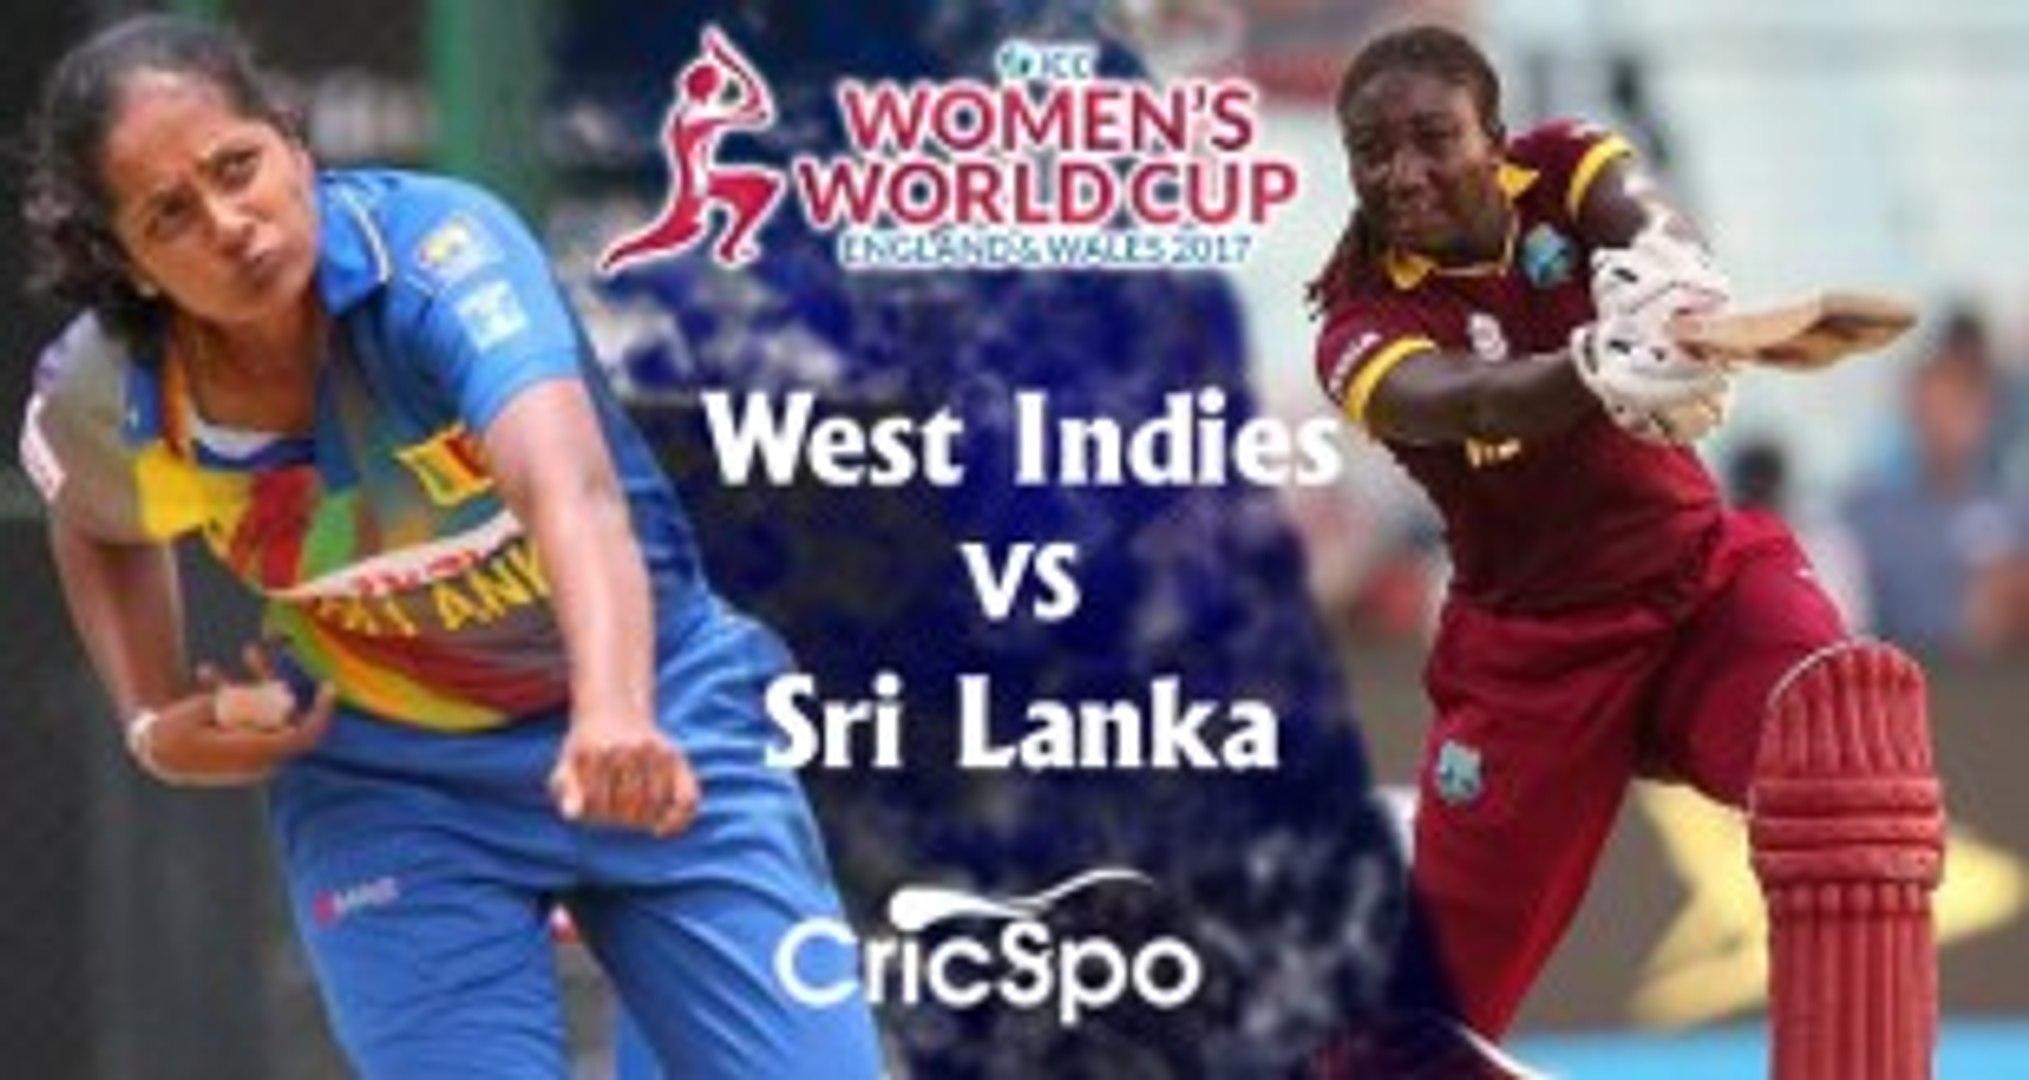 ICC Women World Cup 2017 West Indies Women vs Sri Lanka Women, 20th Match Live Stream